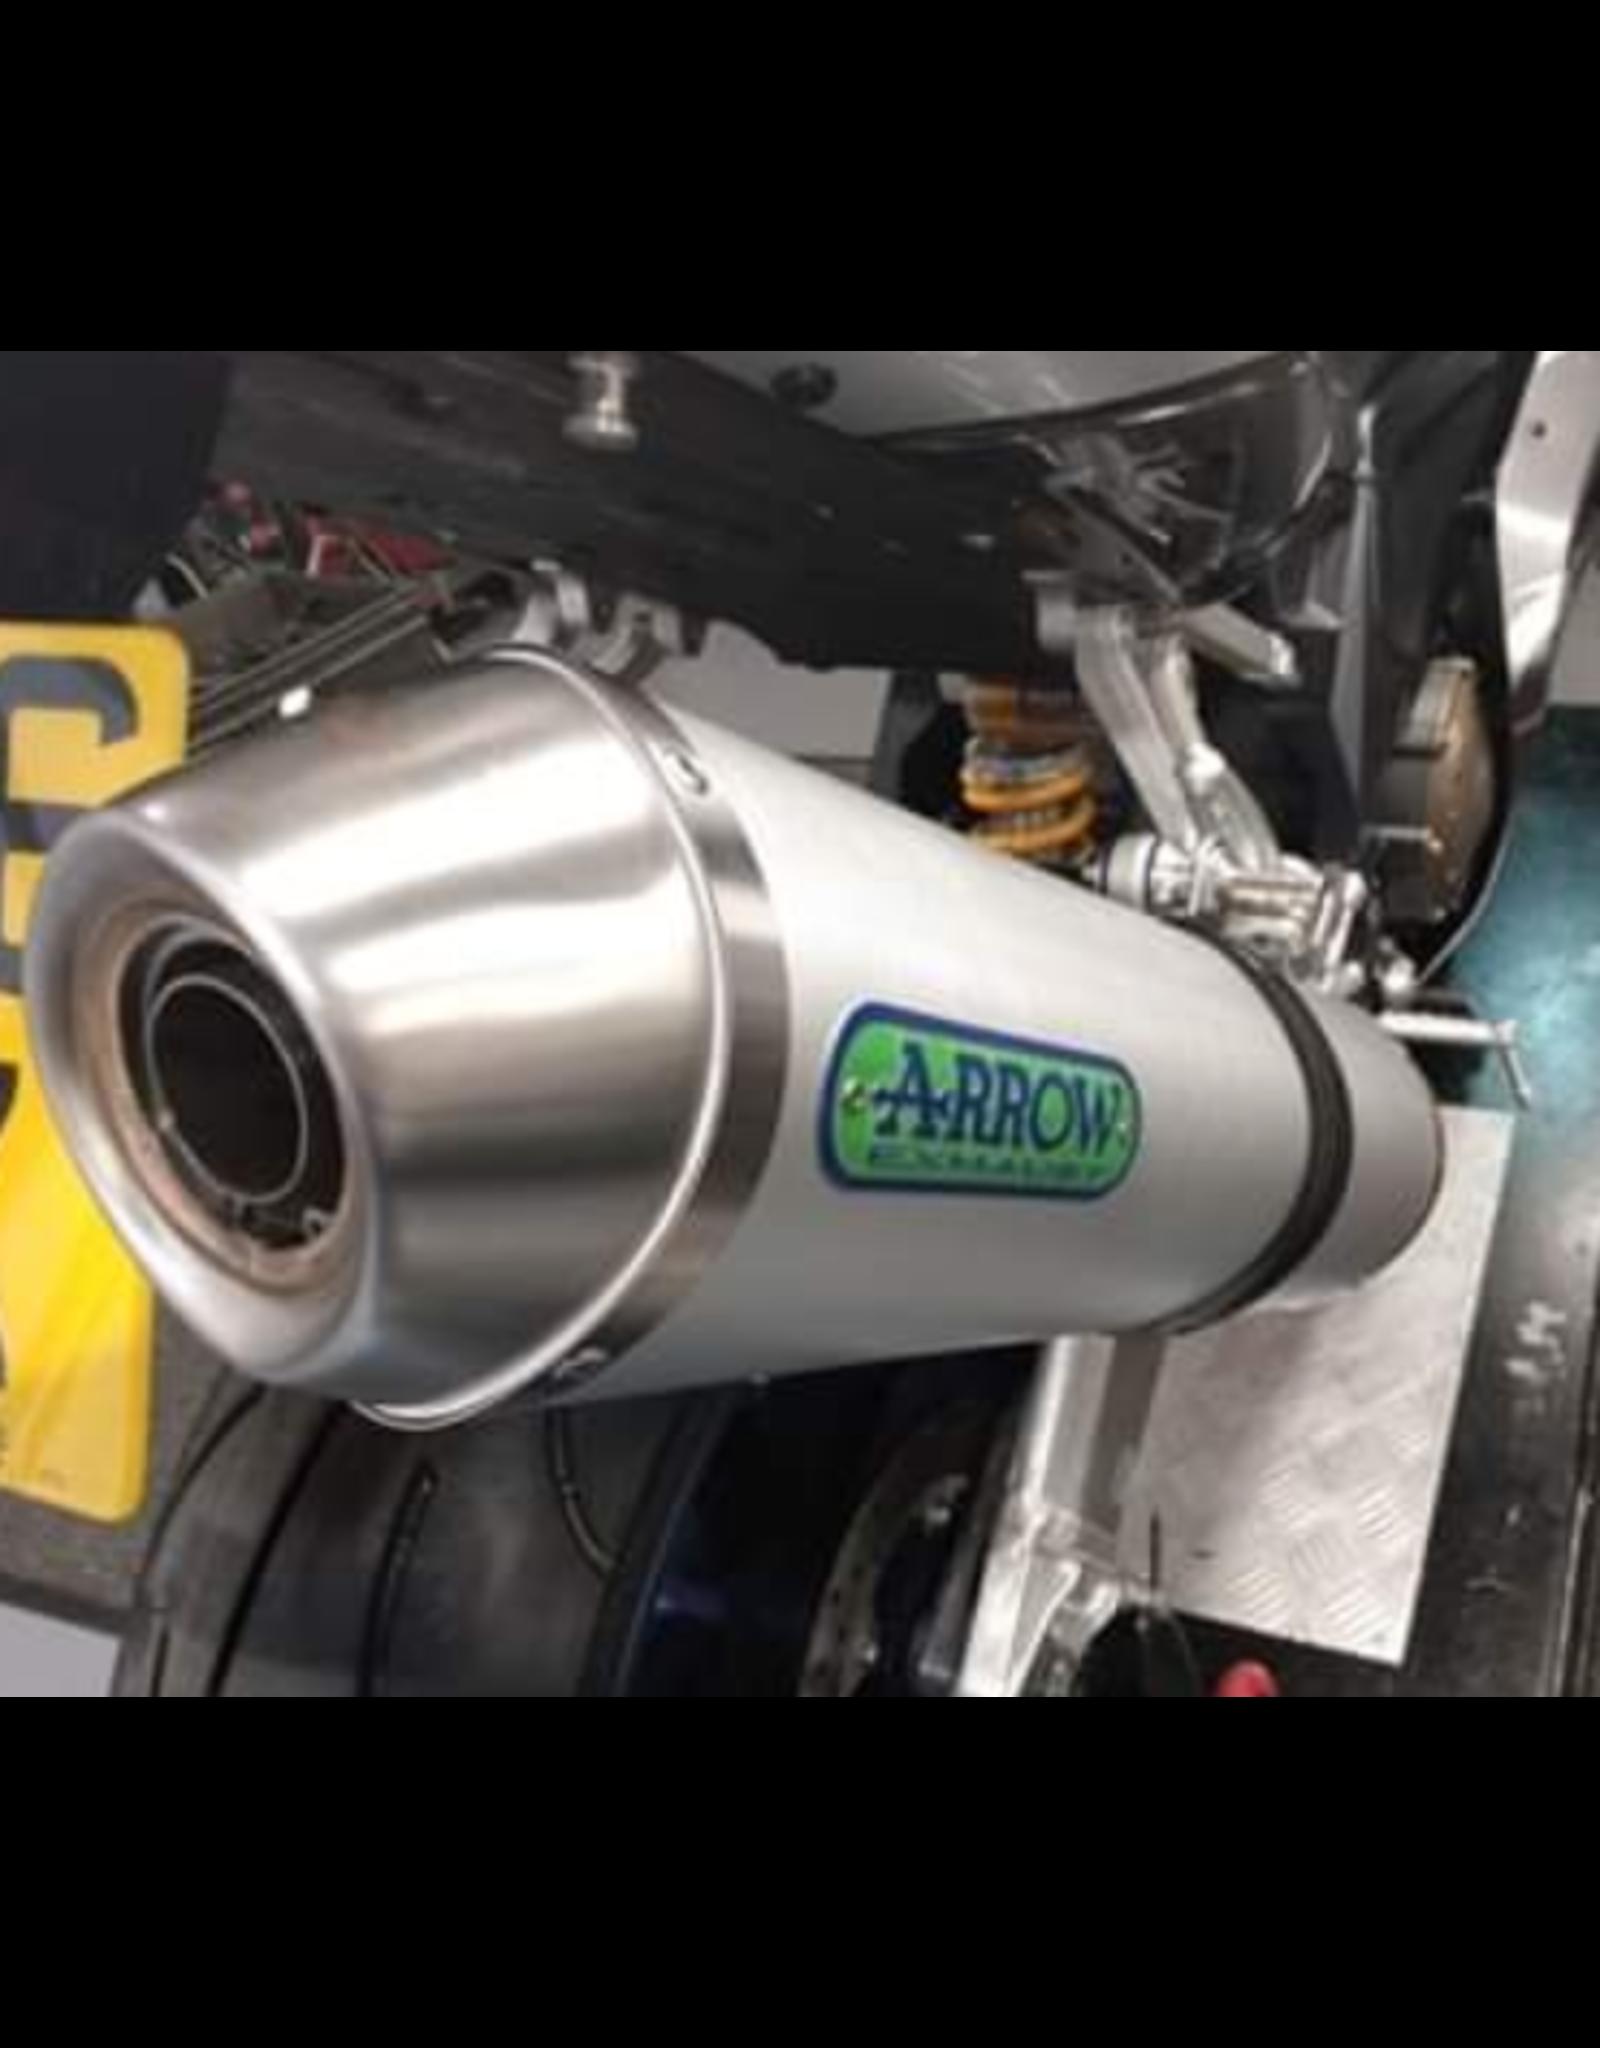 Arrow Arrow exhaust gen 2 , aluminium homologated silencers